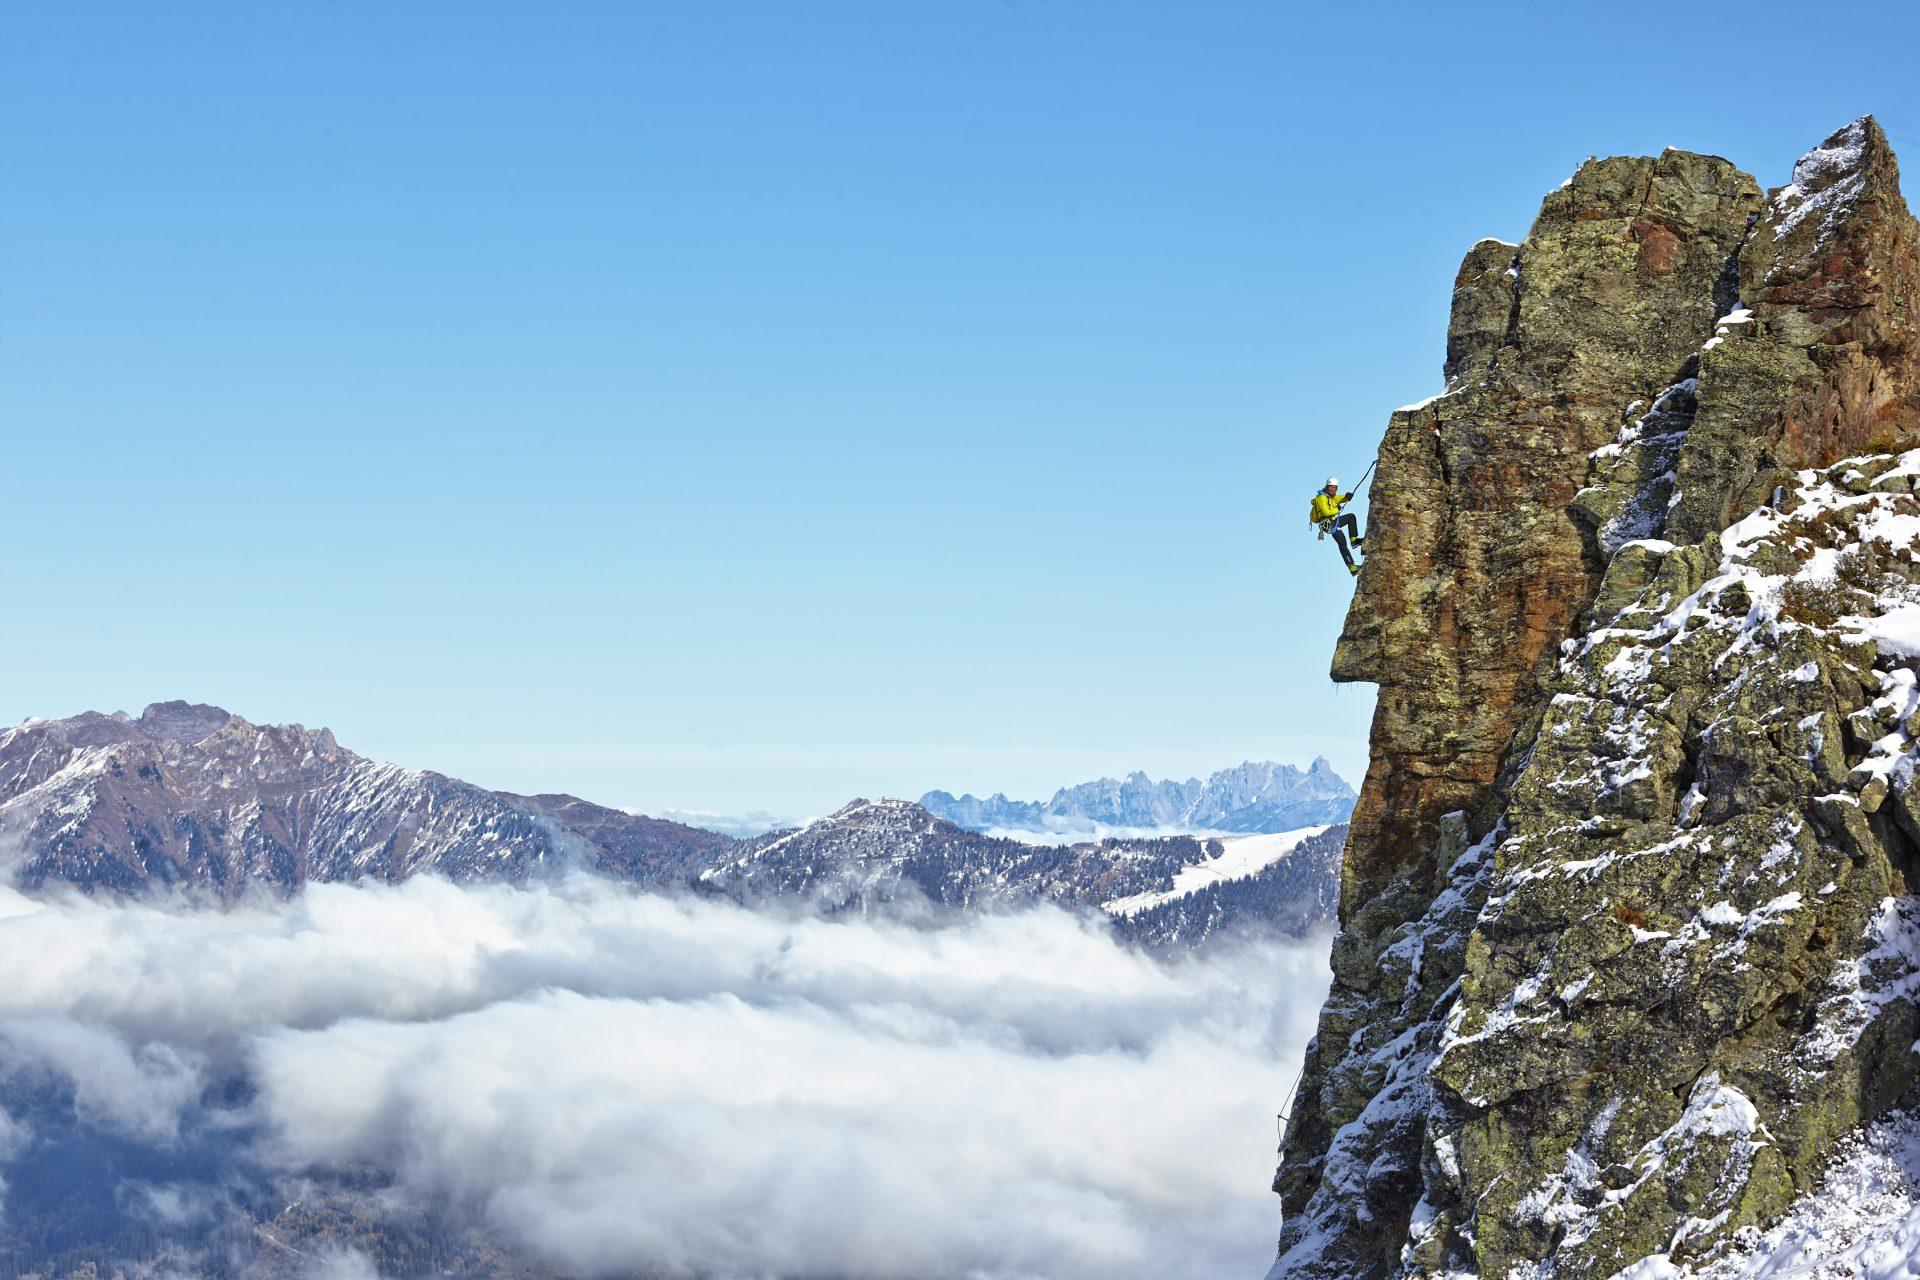 Ein Mann erklimmt einen Gipfel. Fotograf: Jörg Saibou, Köln.